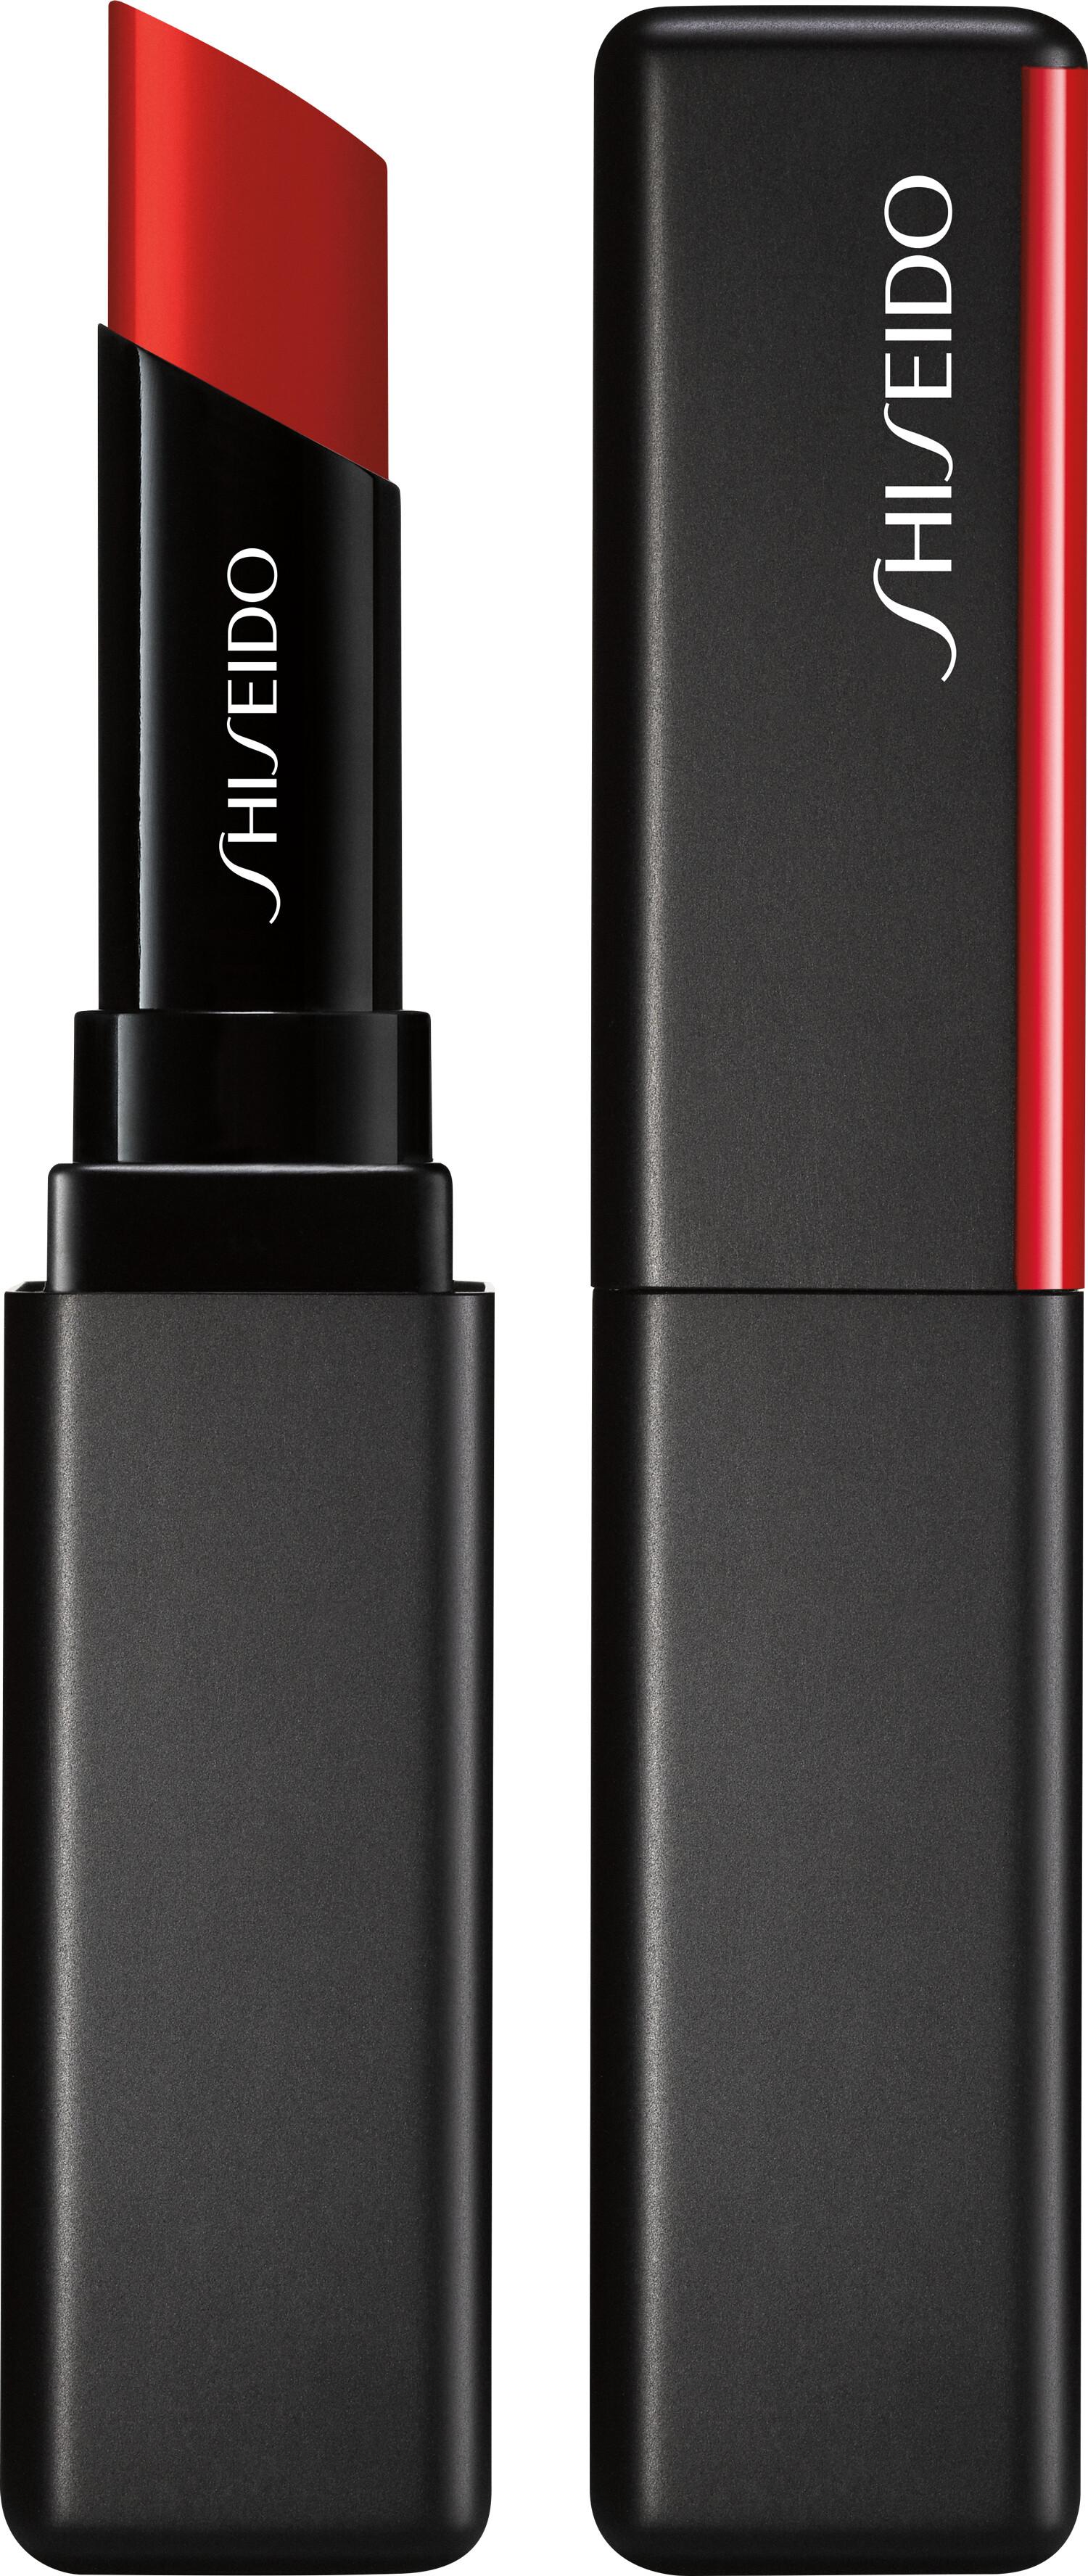 Shiseido VisionAiry Gel Lipstick 1.6g 220 - Lantern Red